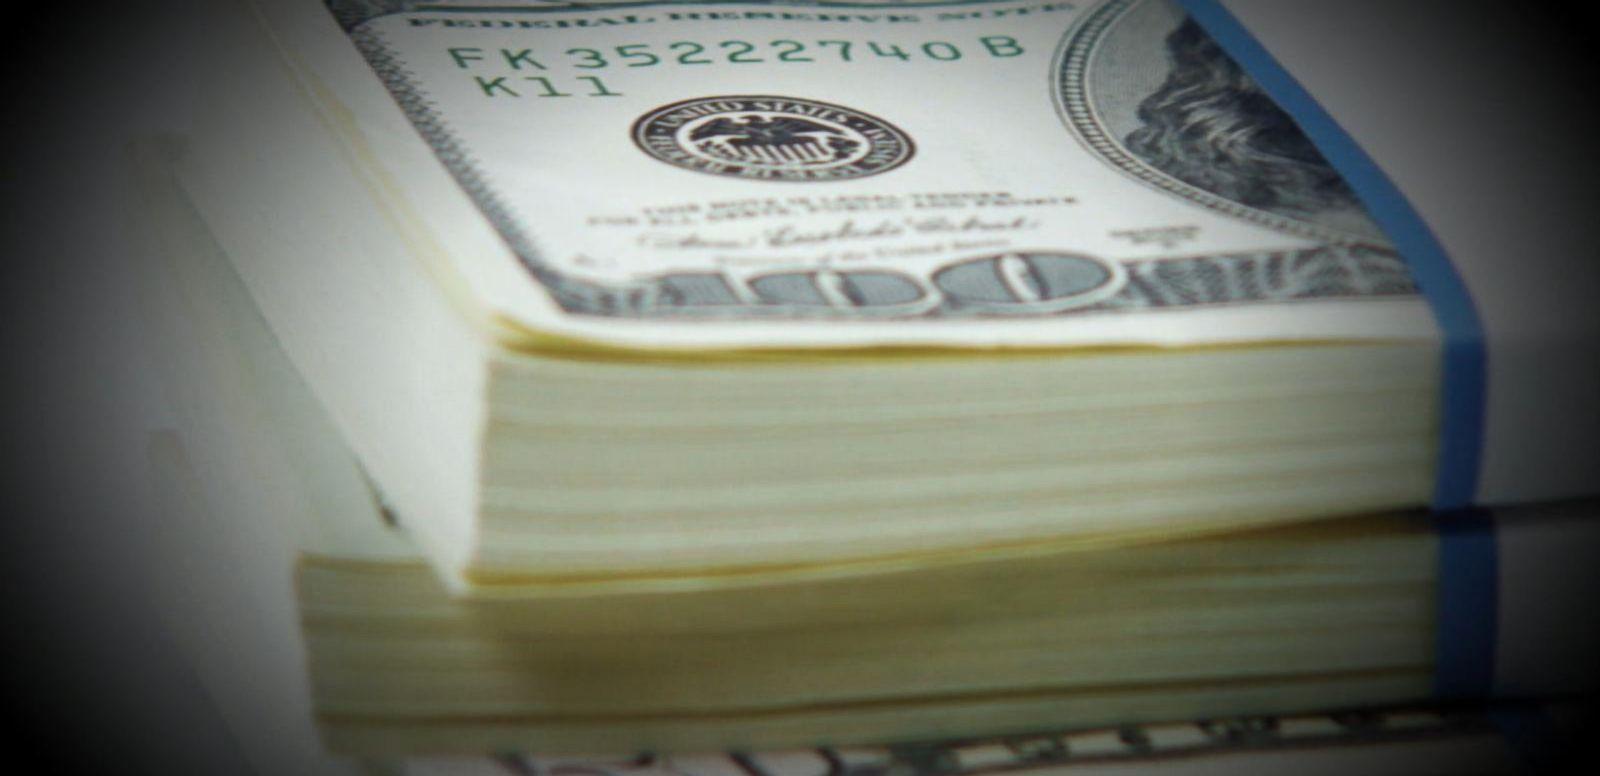 VIDEO: Financial Alert: Inside Bank Teller Identity Theft